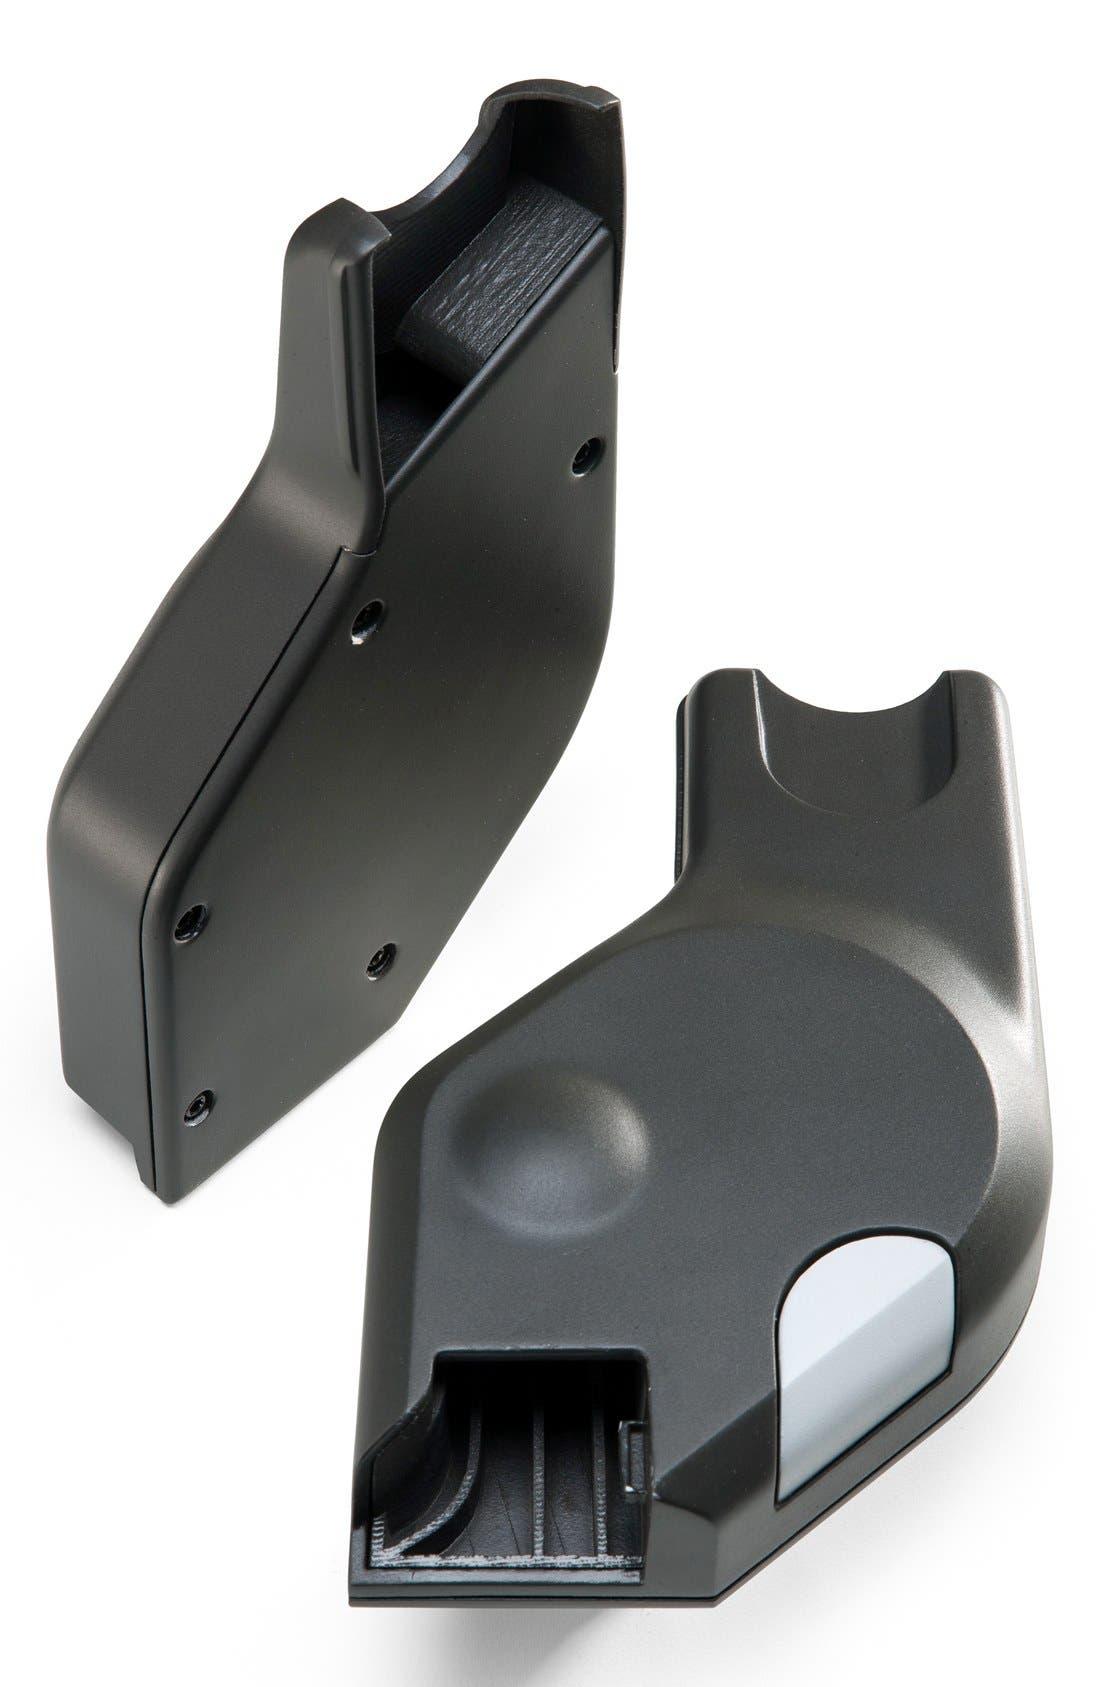 Stokke 'Xplory®' & Stokke 'Scoot' Car Seat Adaptor for Maxi Cosi & Nuna